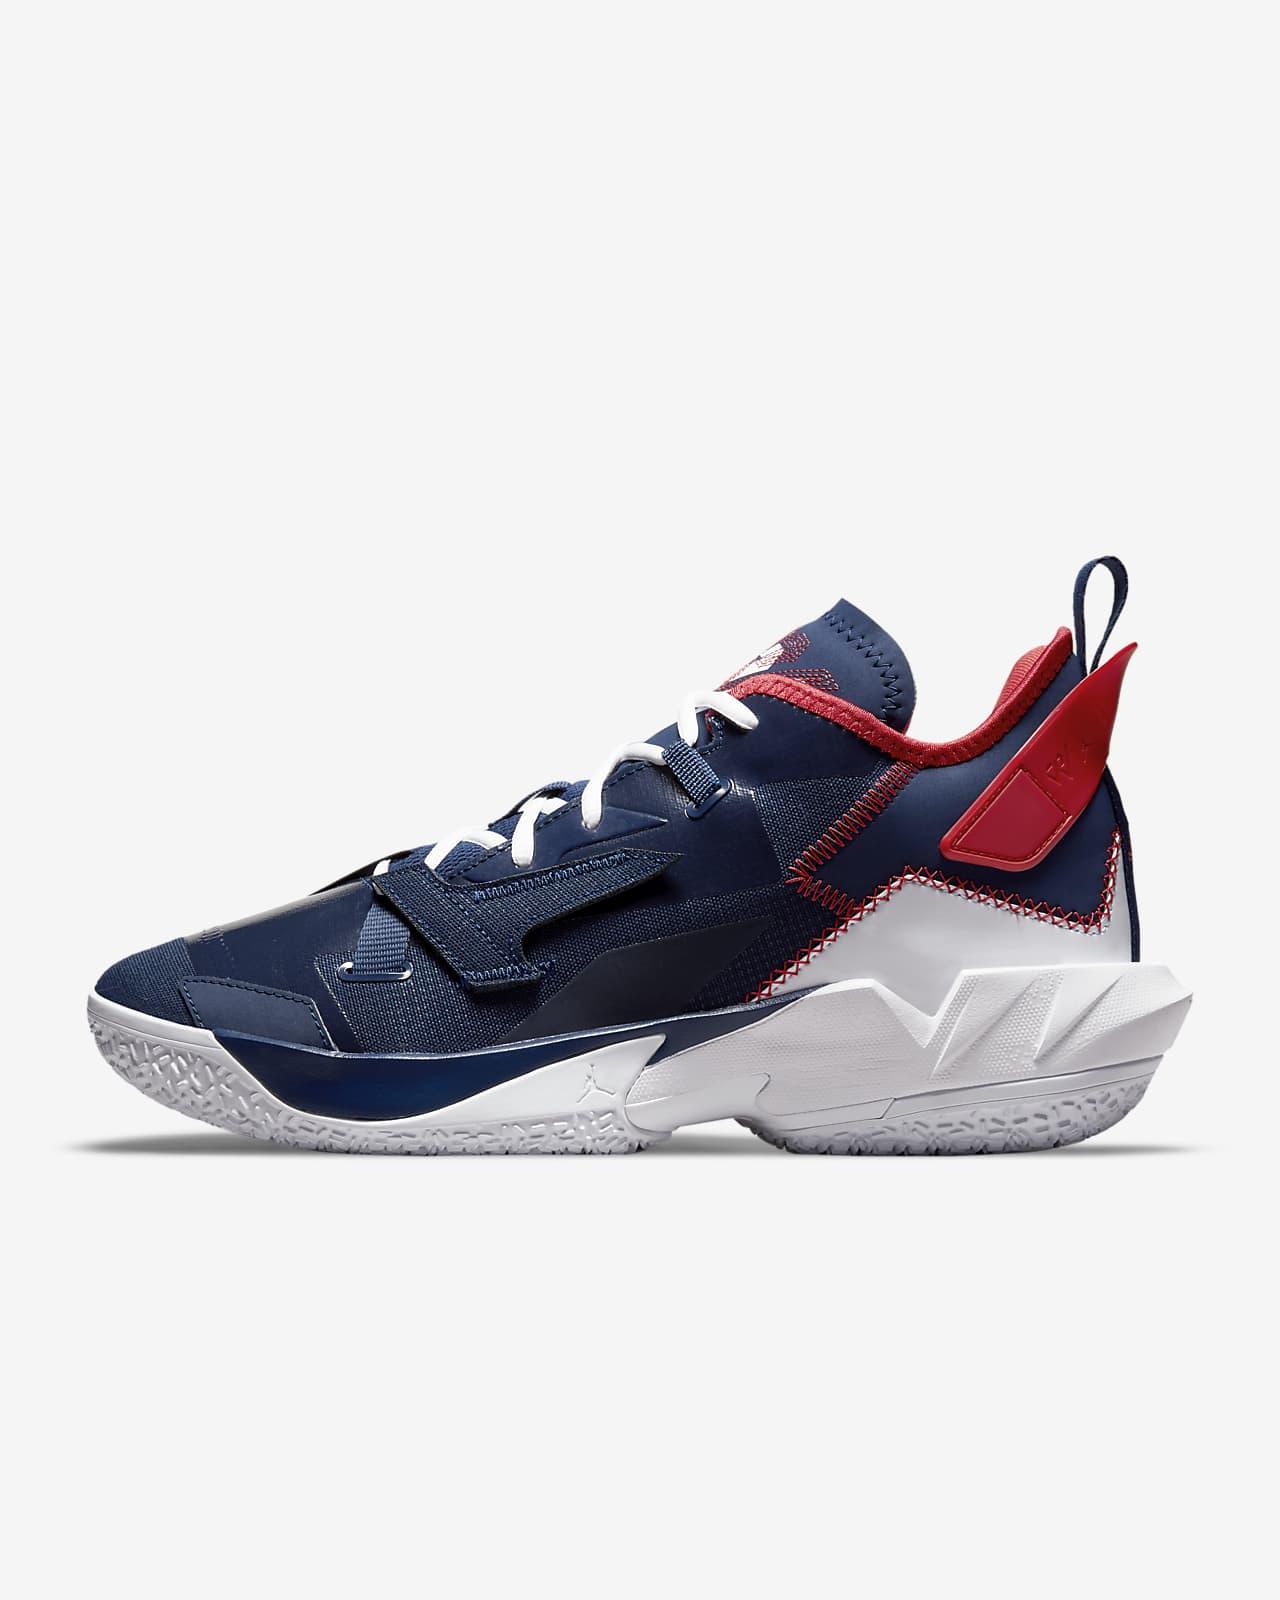 Jordan Why Not Zer0.4 PF 男子篮球鞋